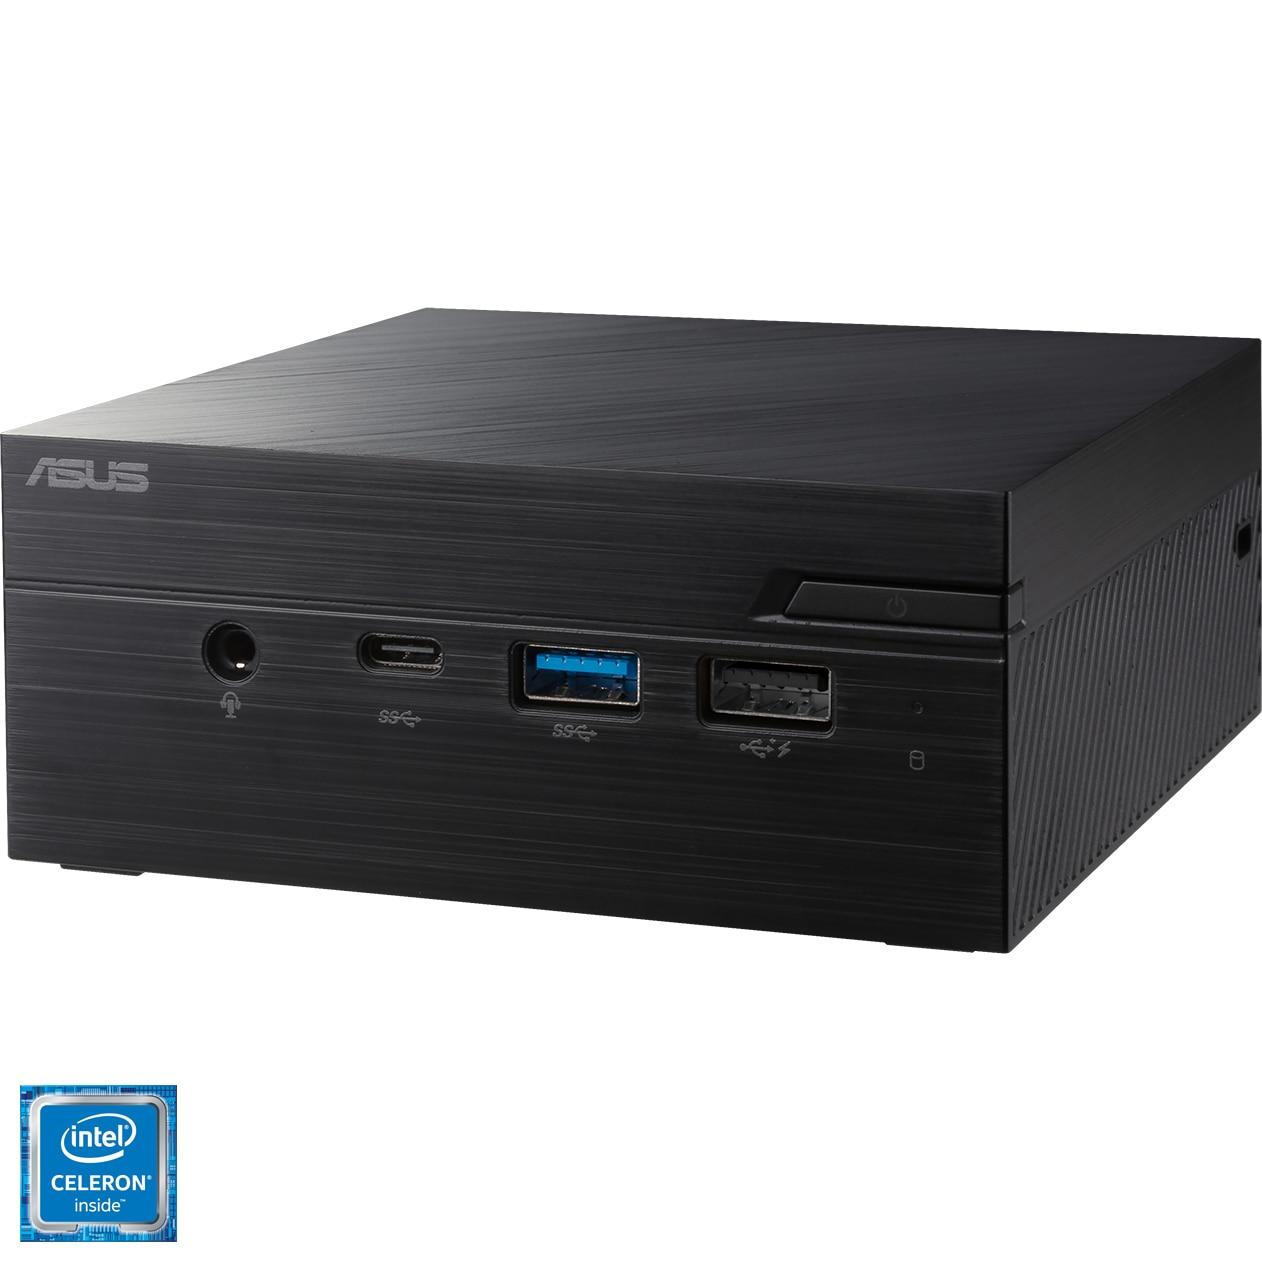 Fotografie Mini PC ASUS PN40-BBC521MV cu procesor Intel Celeron® N4020 pana la 2.80GHz, fara RAM, fara stocare, Intel® UHD Graphics 600, No OS